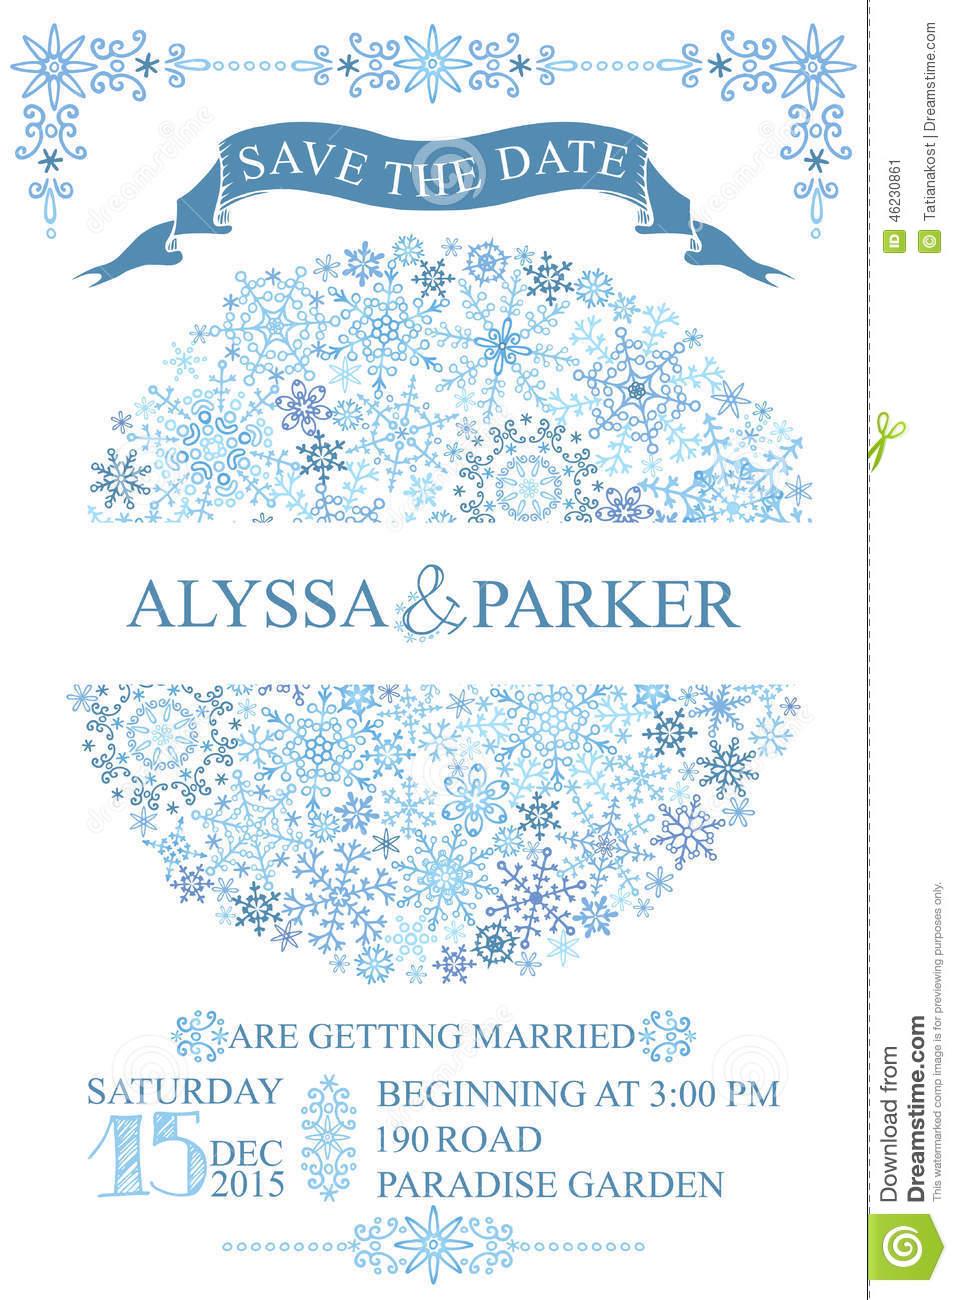 Winter Wedding Save Date Card.Snowflakes Circle Stock Photo.